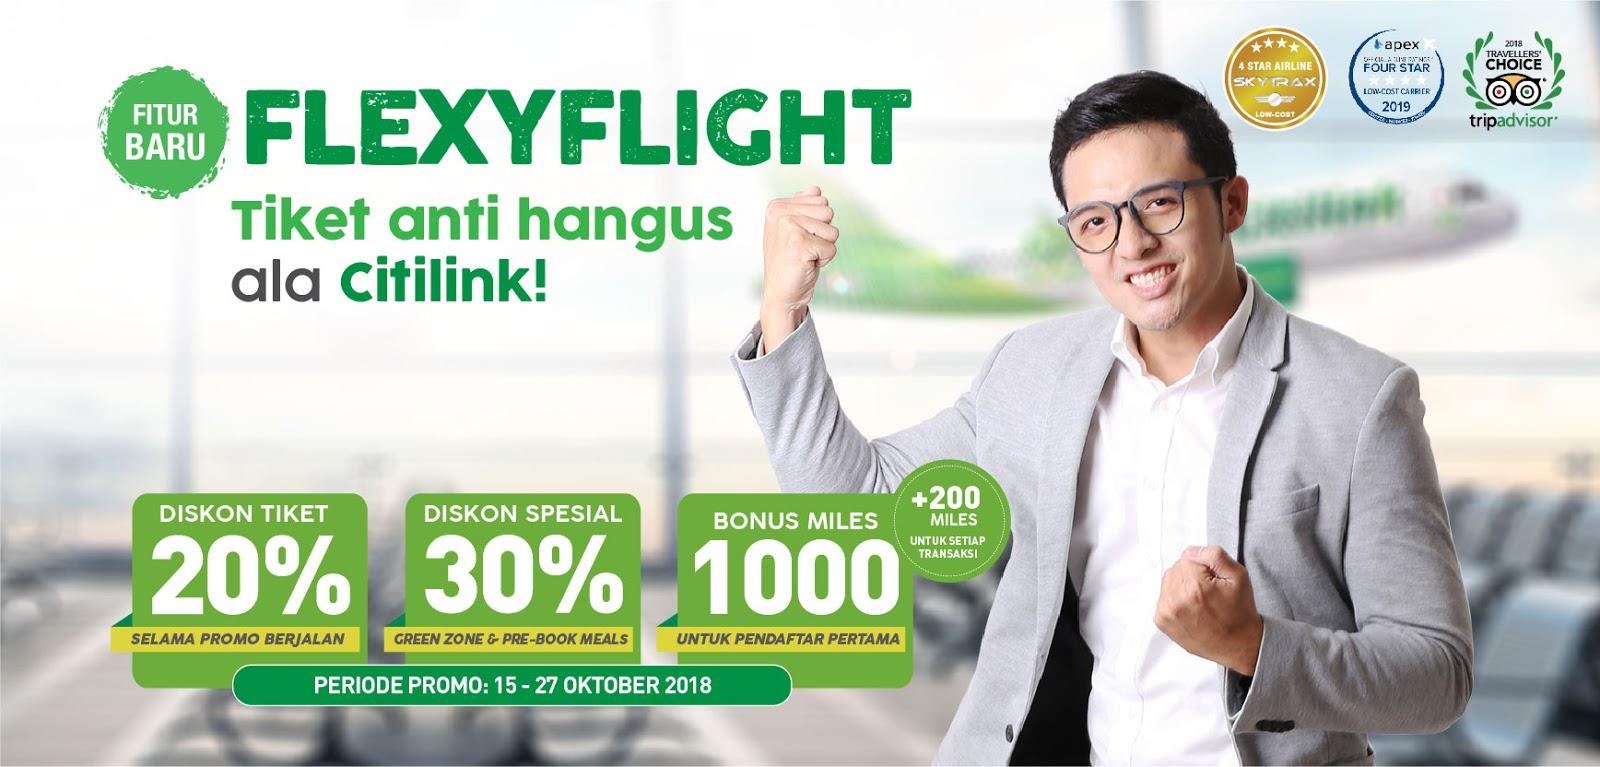 Citilink - Promo Setu Terbang Pakai FlexyFlight + Diskon Tiket 20% (s.d 27 Otk 2018)